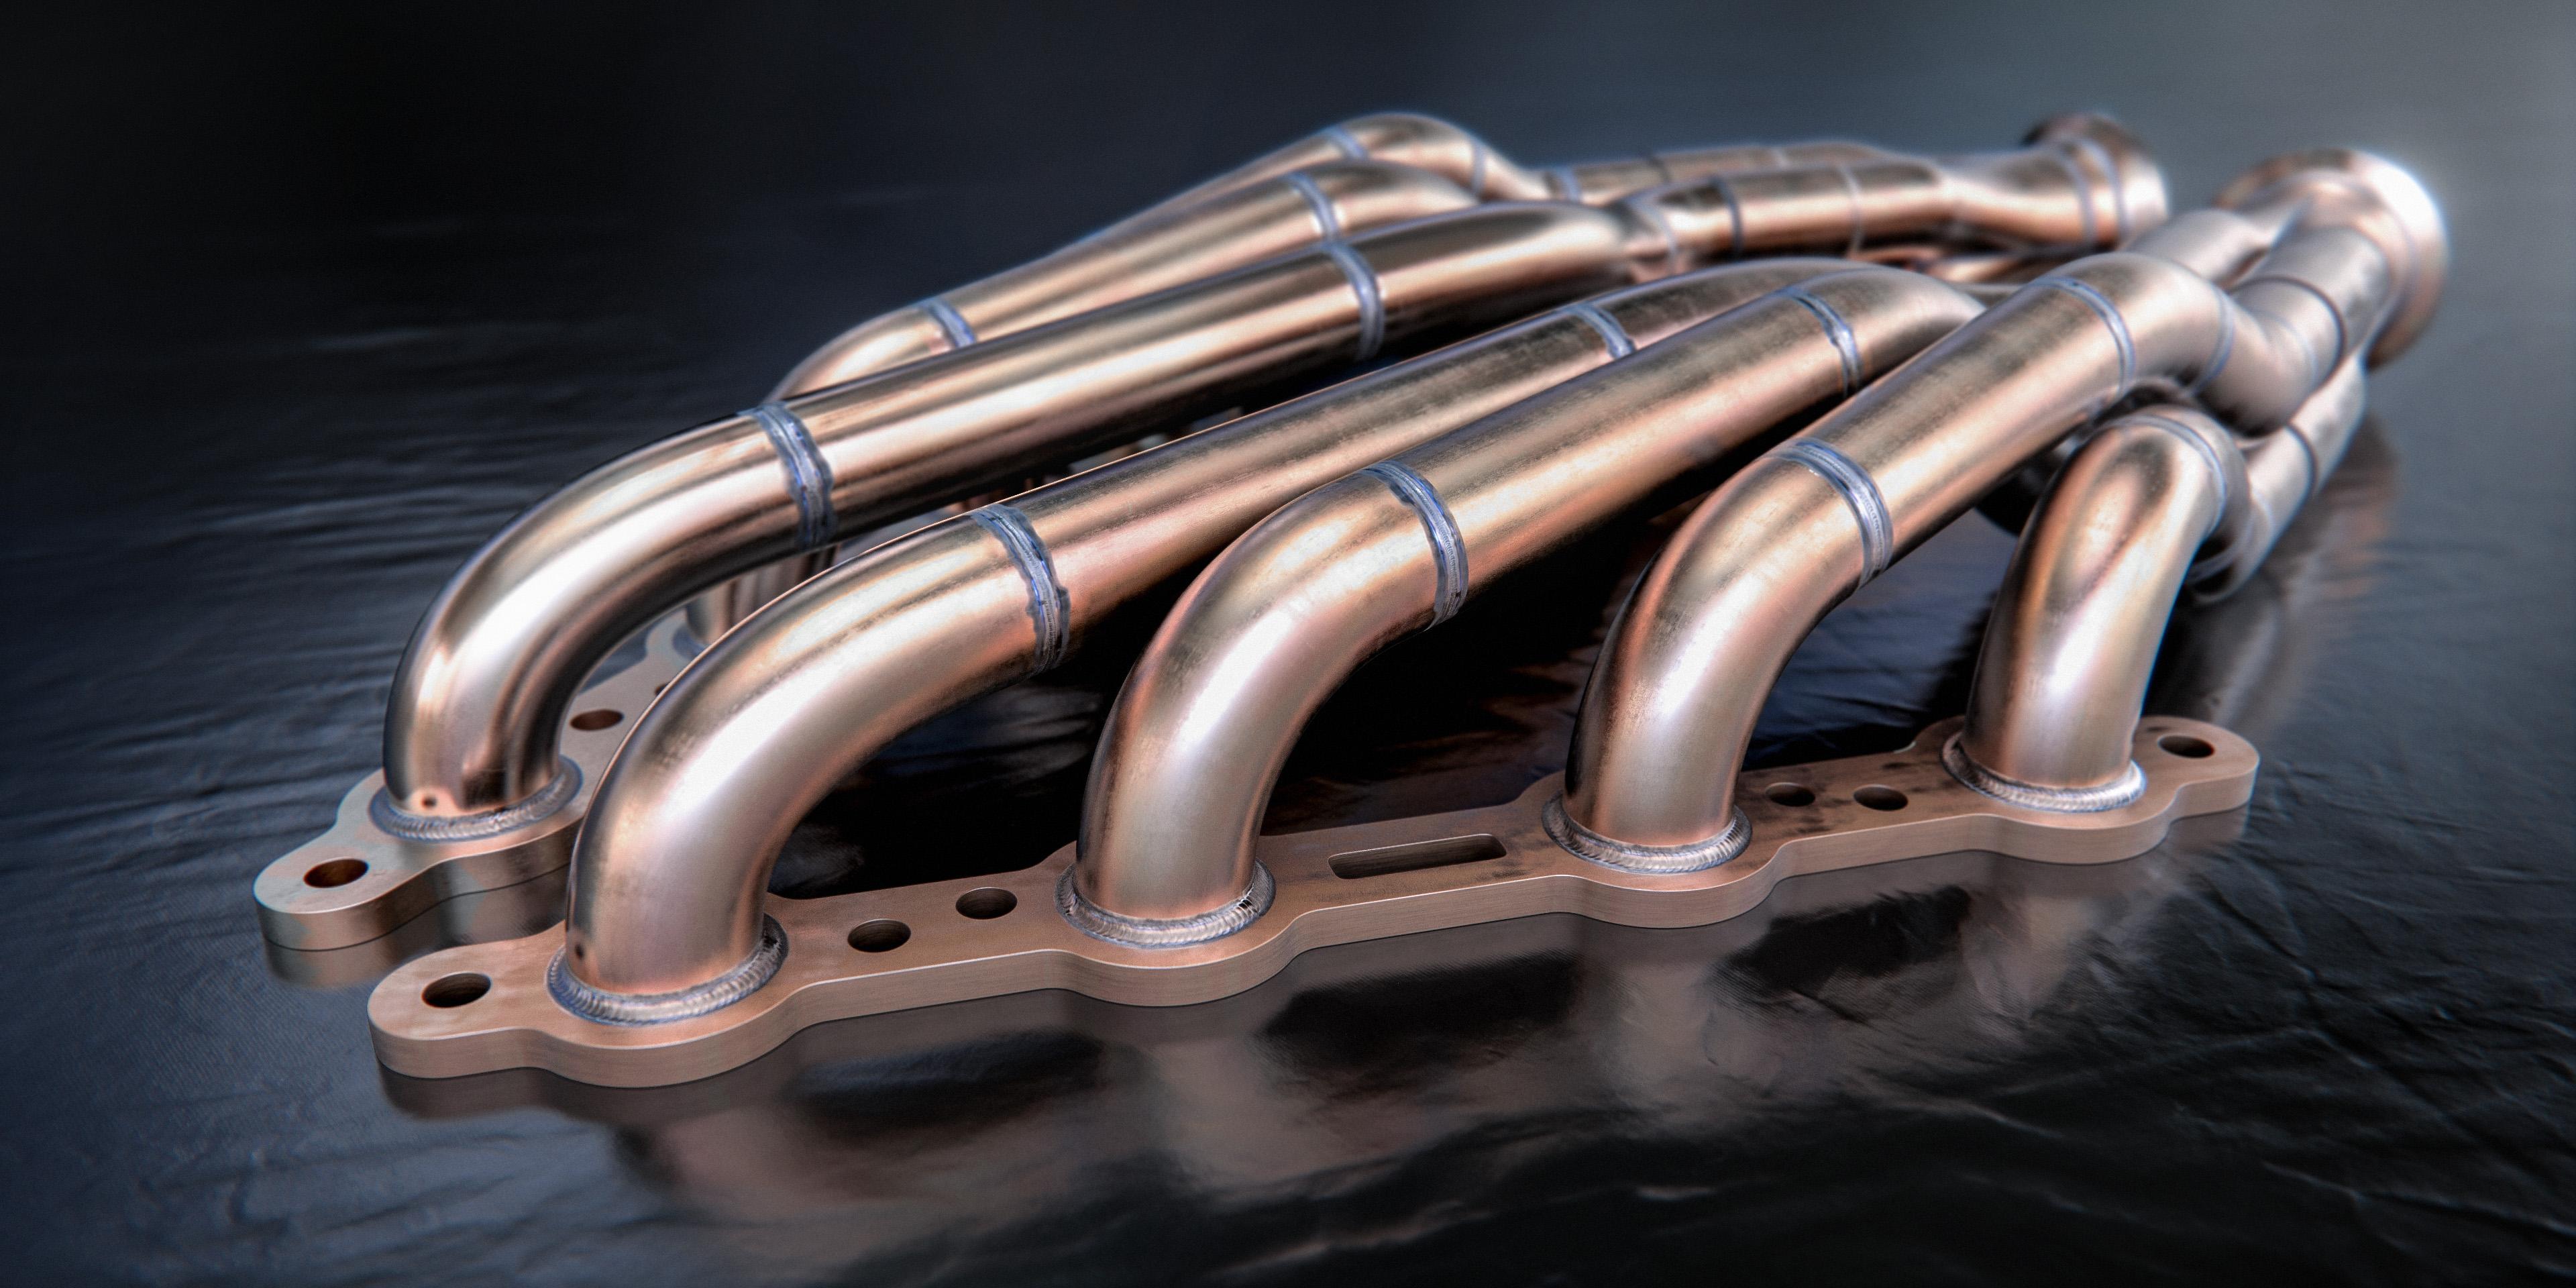 magnus-skogsfjord-nx-keyshot-manifold-welds-03